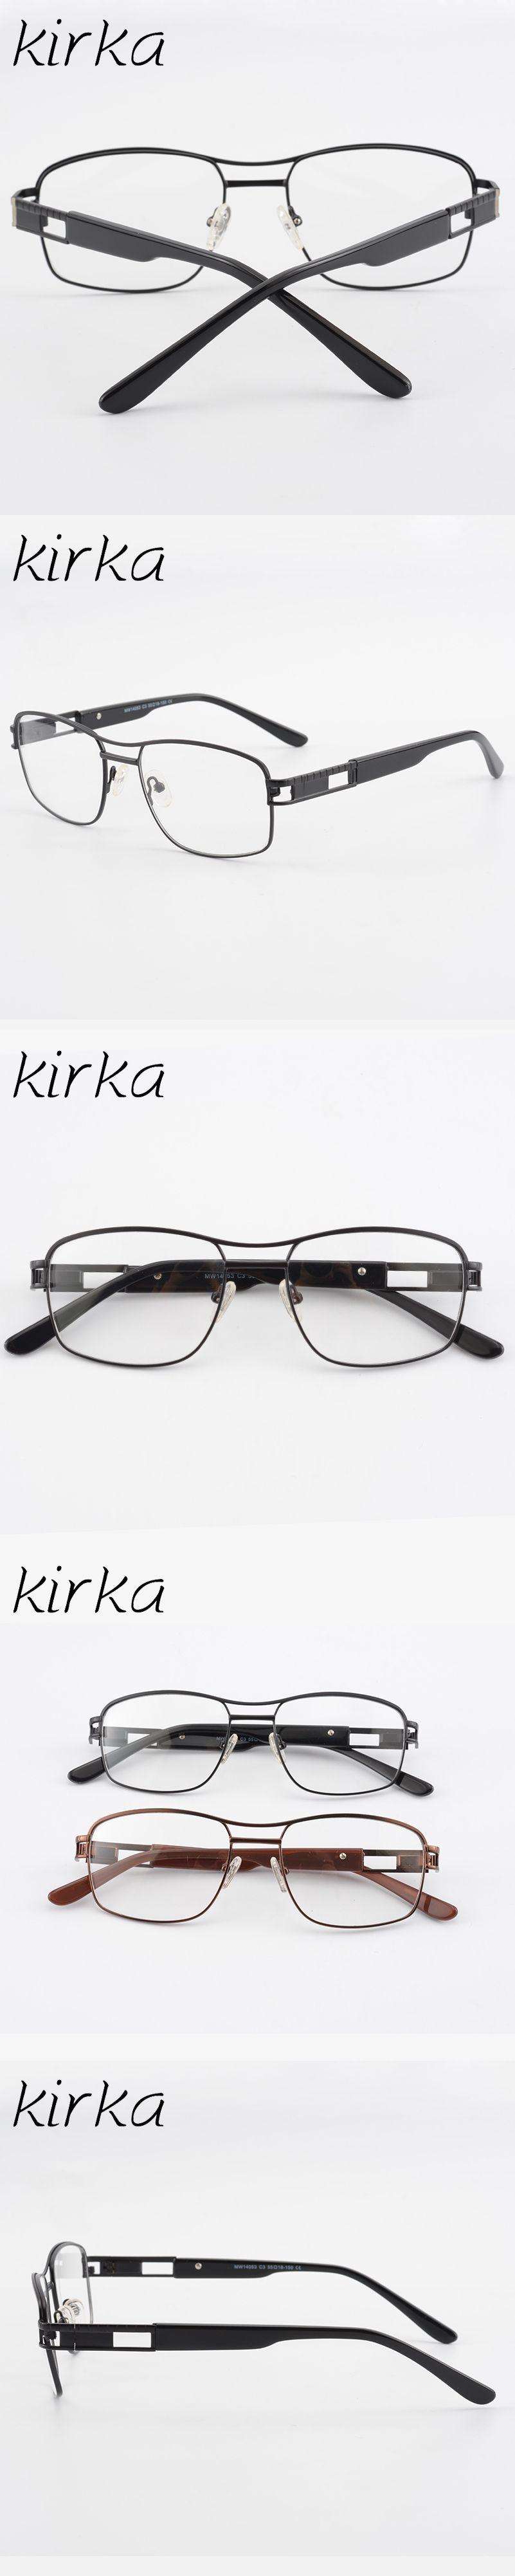 3dc0fa09fb Kirka Black Color Metal Eyewear Optical Eyeglasses Glasses Frame Men Oculos  de grau Male Business Eye